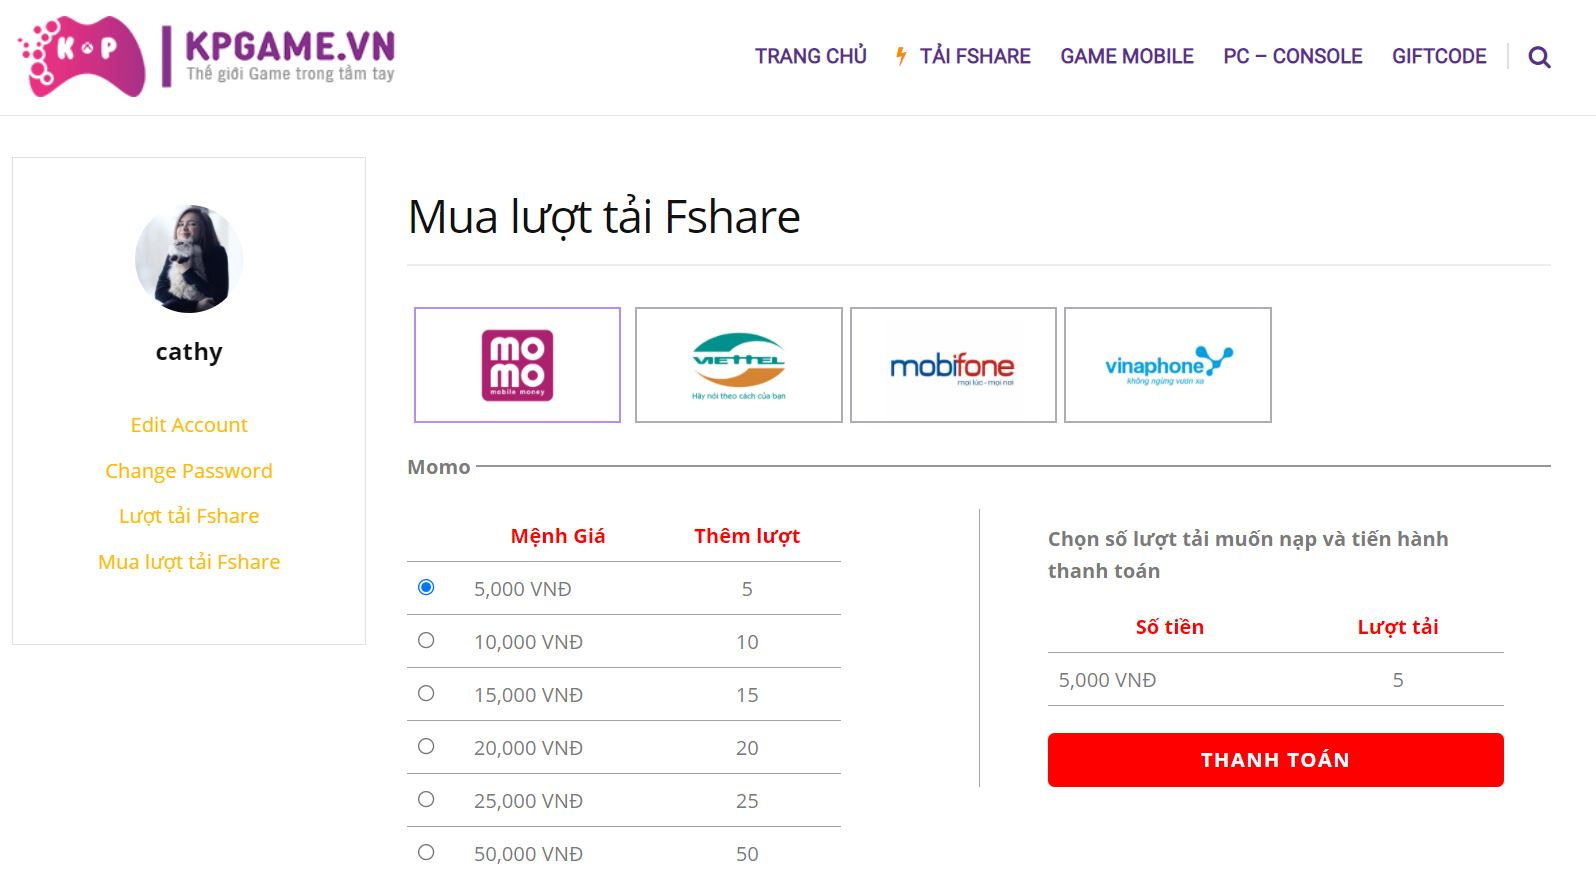 Mua lượt tải Fshare ở Kpgame.vn